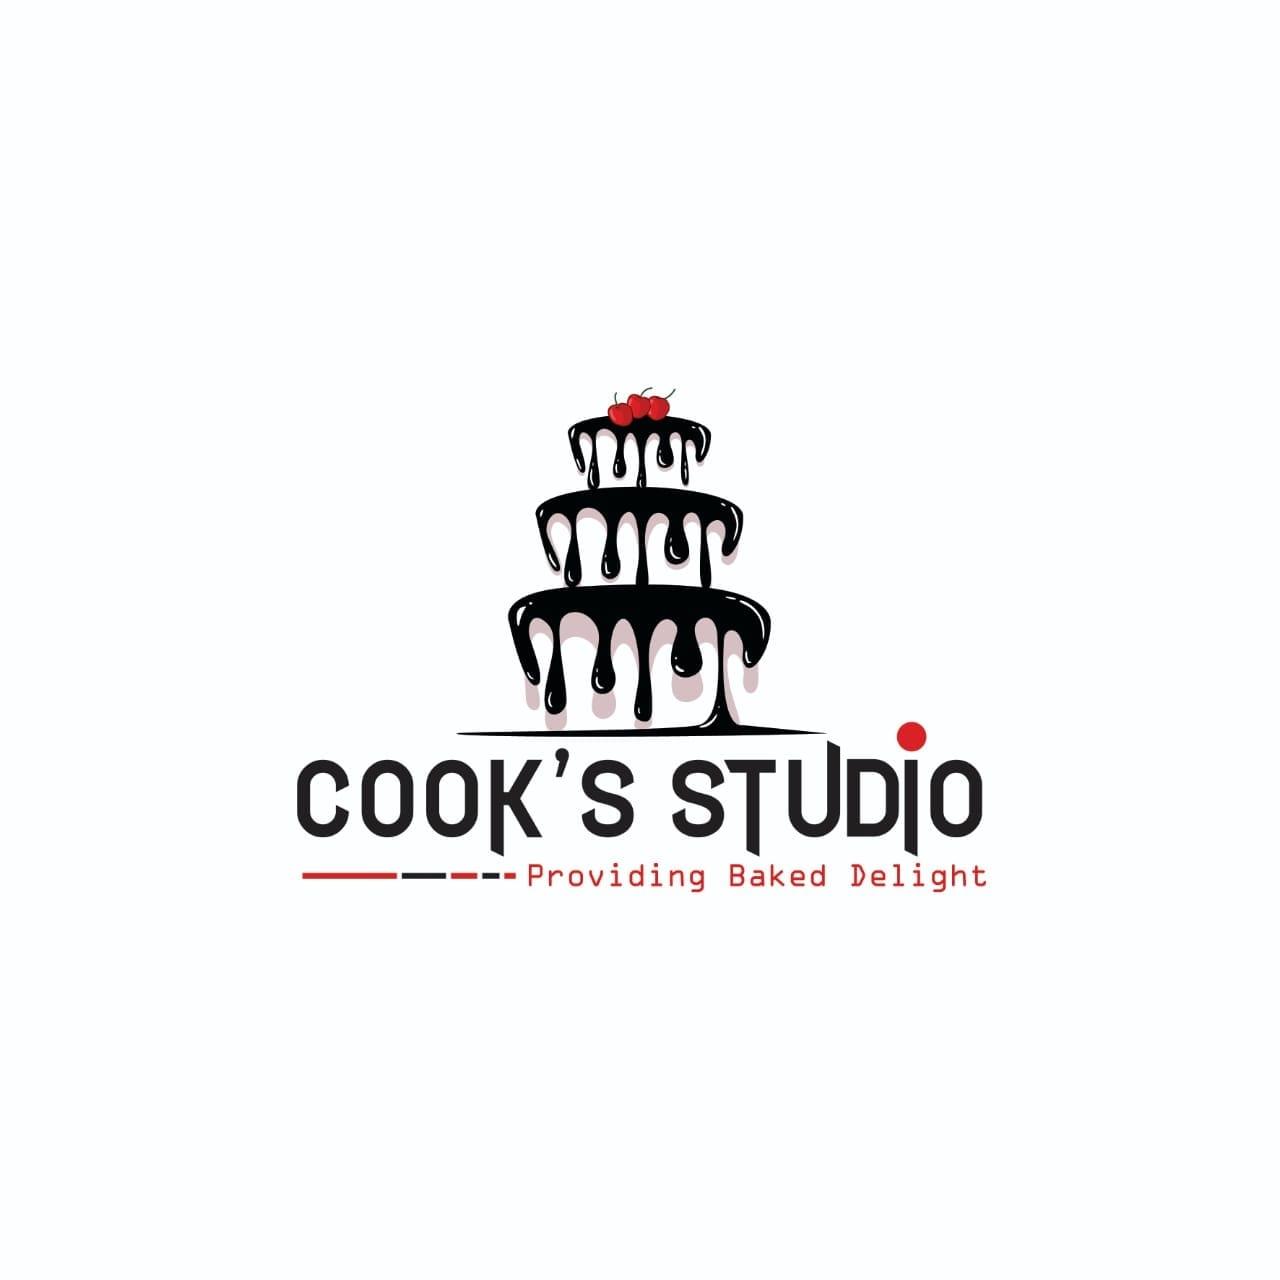 Cooks Studio